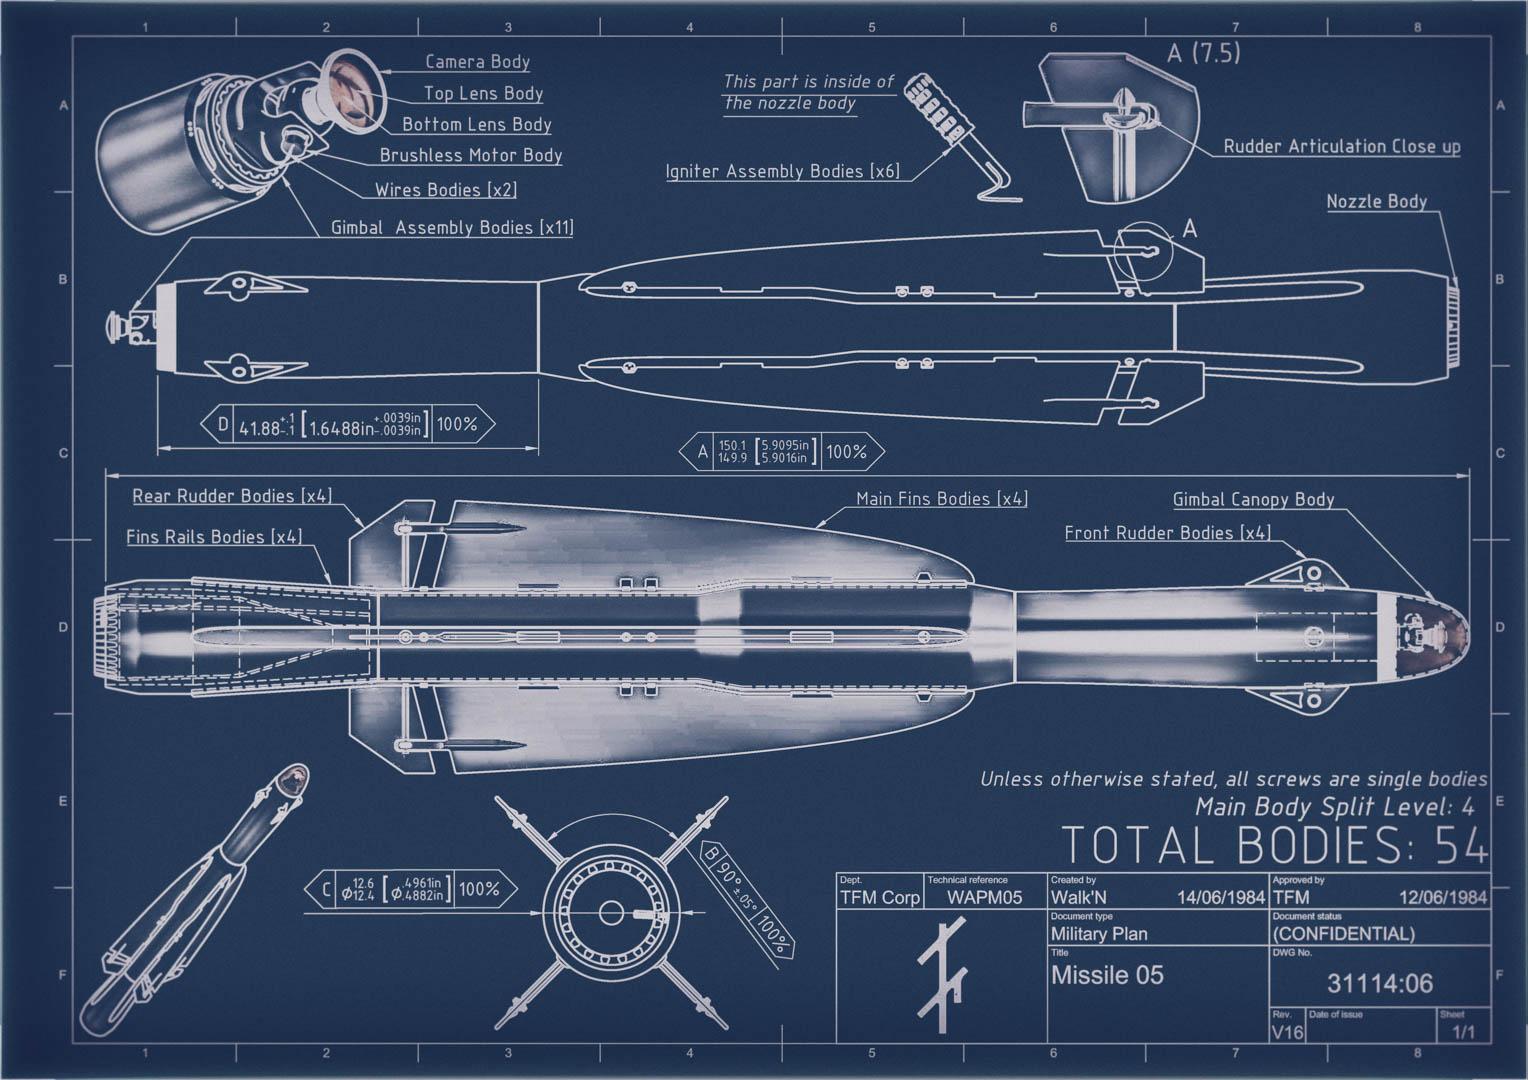 Missile Asset Kit - Missile 06.jpg